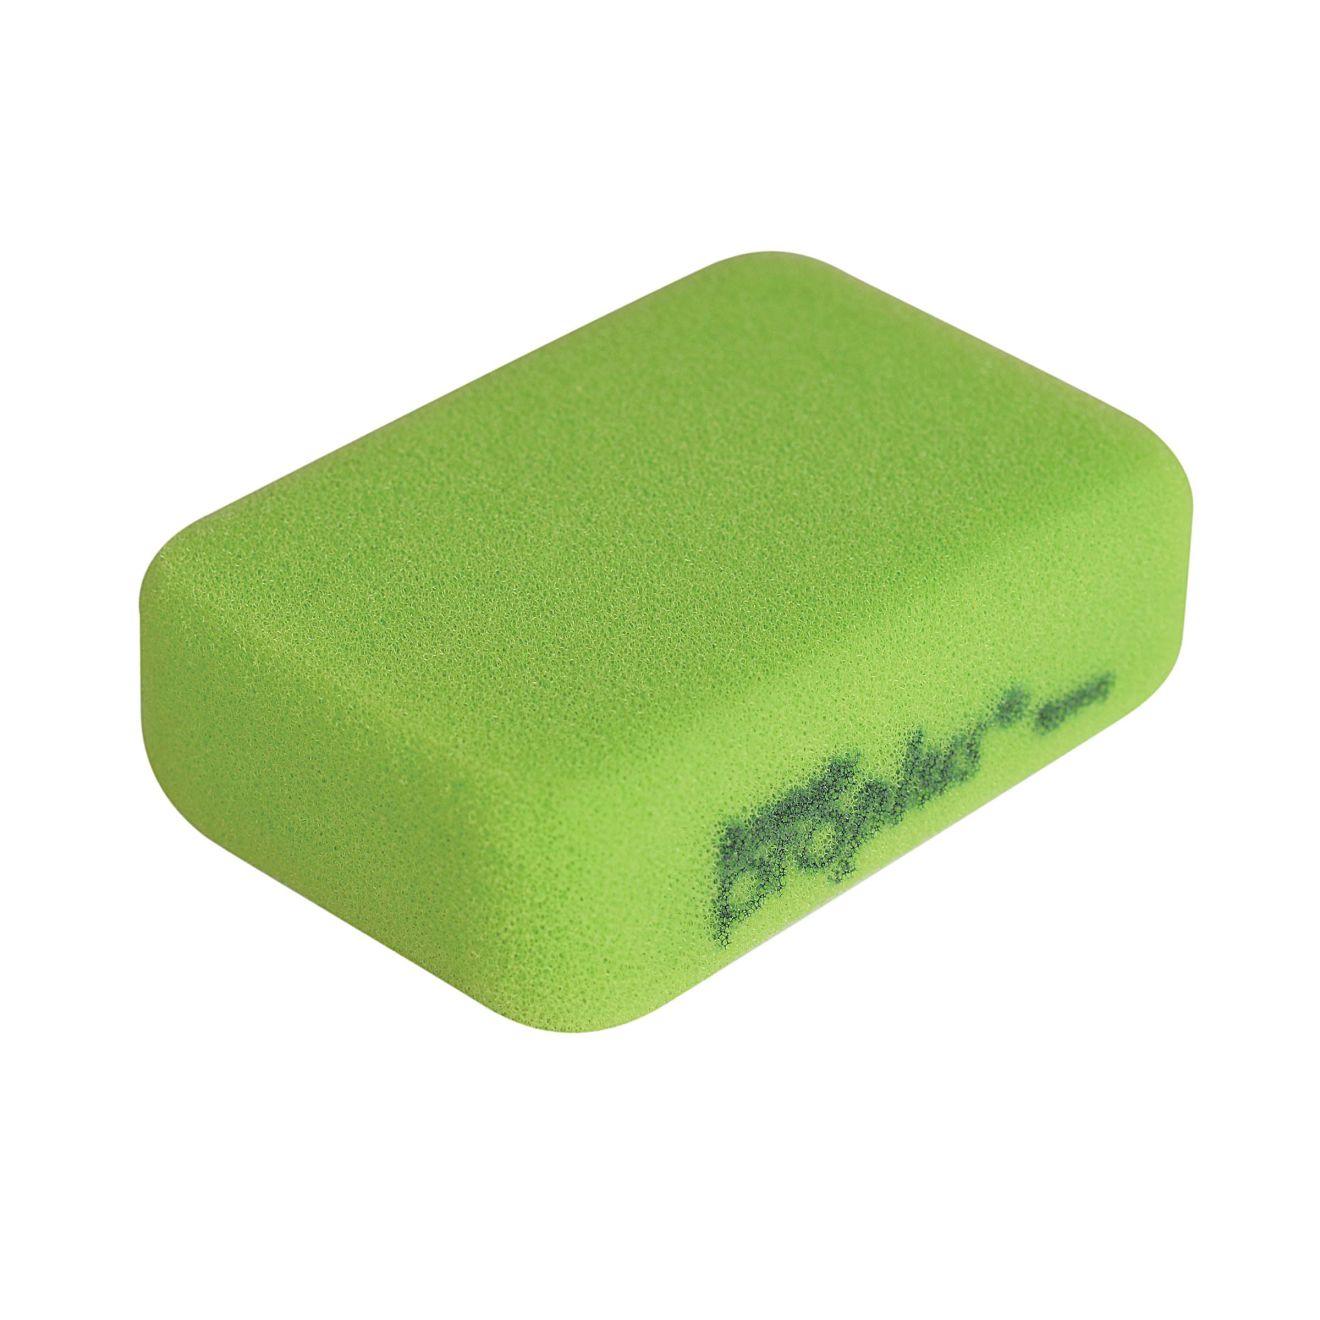 Armaly ProPlus Epoxy Grouting Pre-Wipe Sponge